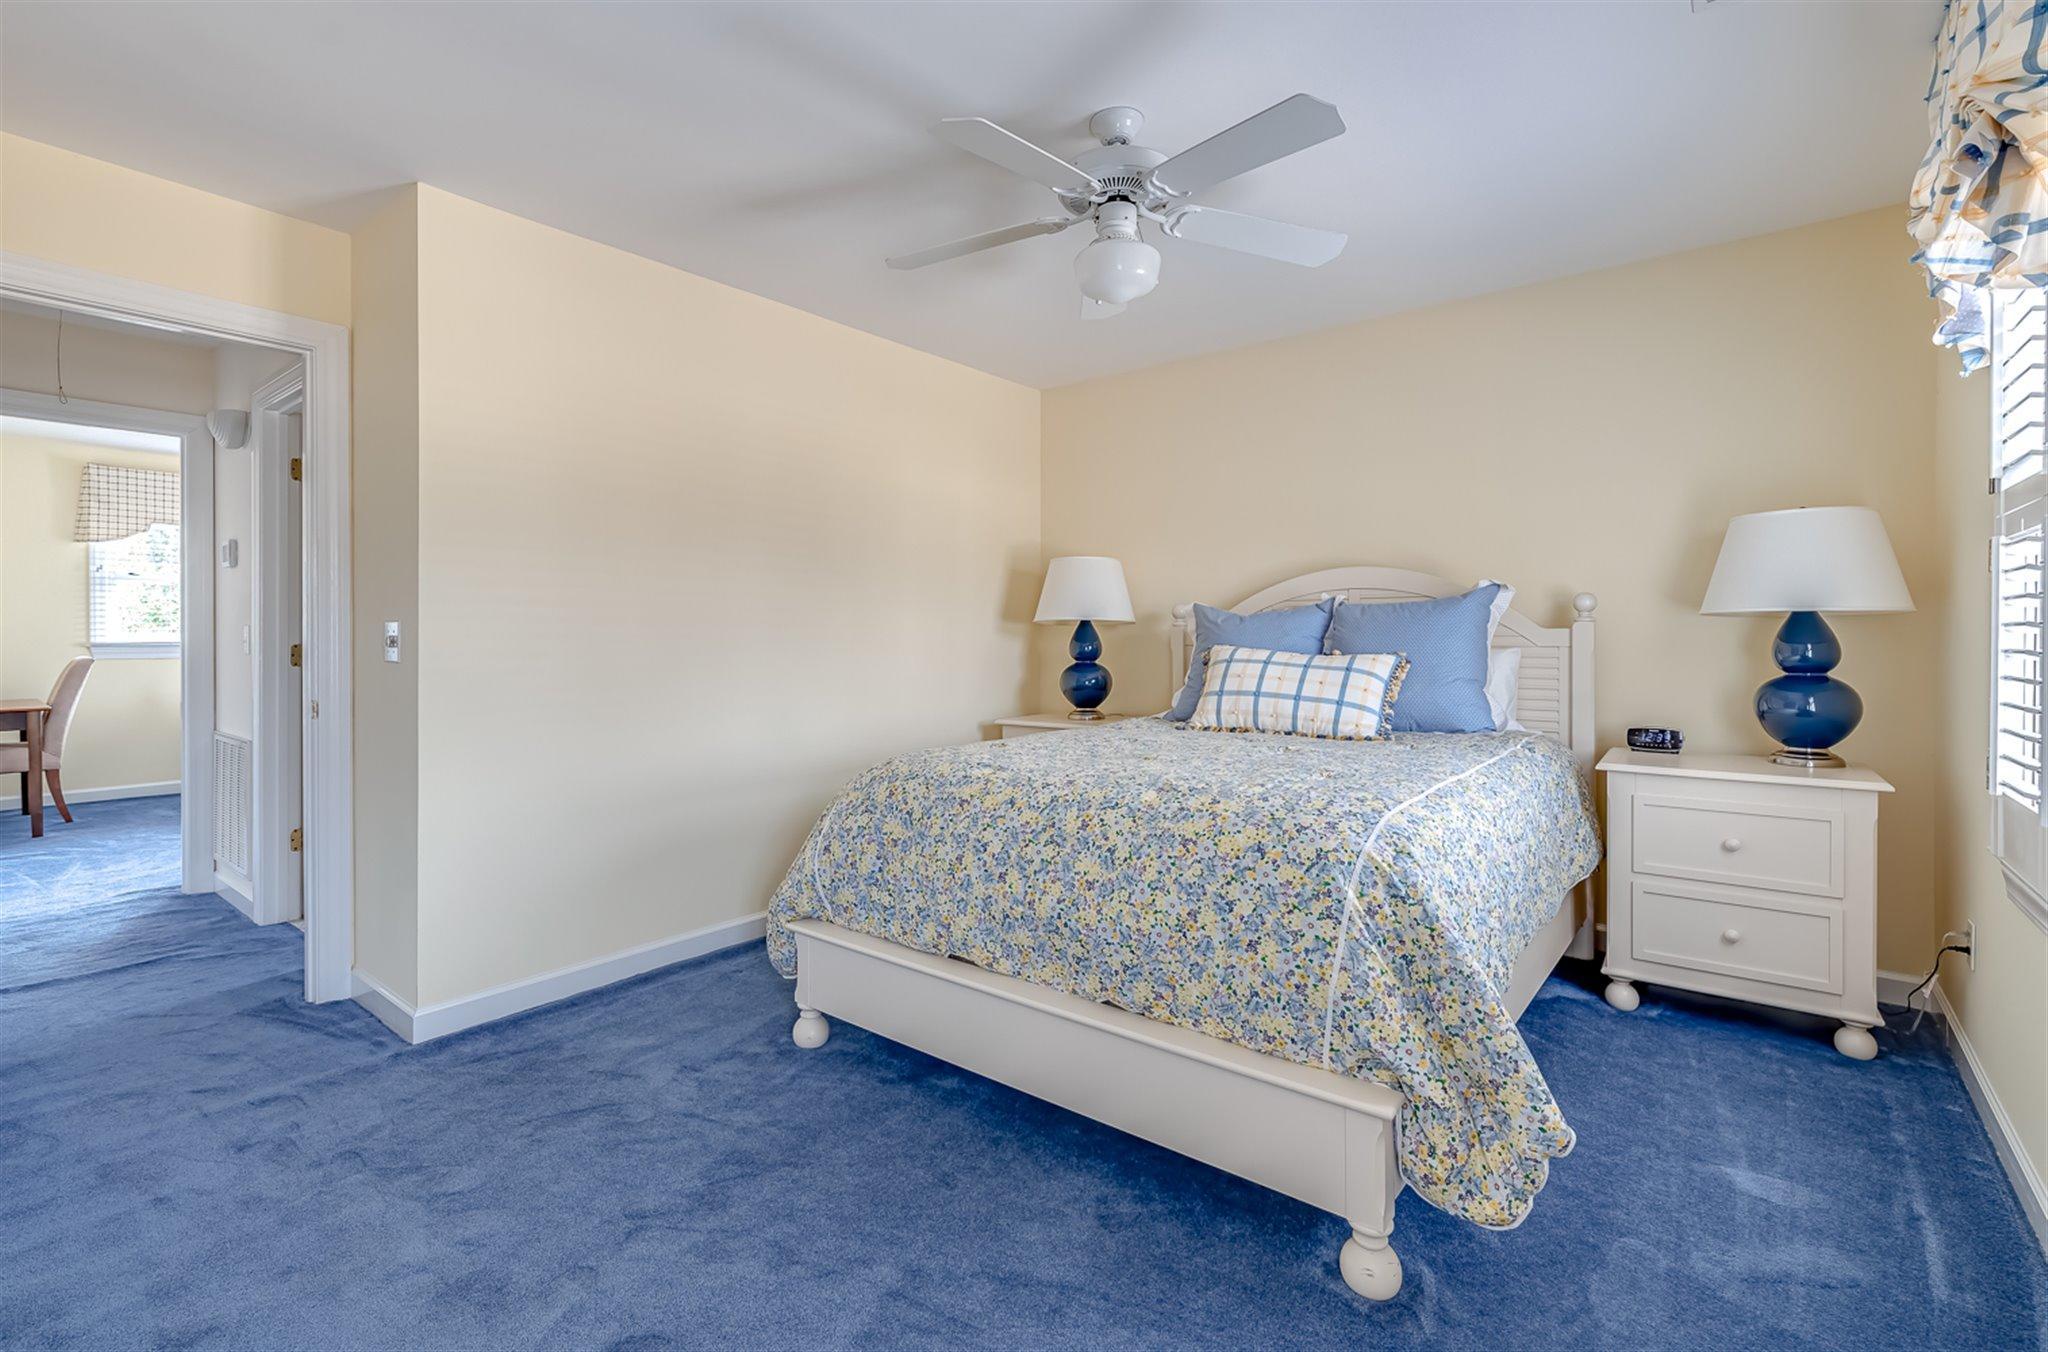 Indigo Point Homes For Sale - 50 Indigo Point, Charleston, SC - 10